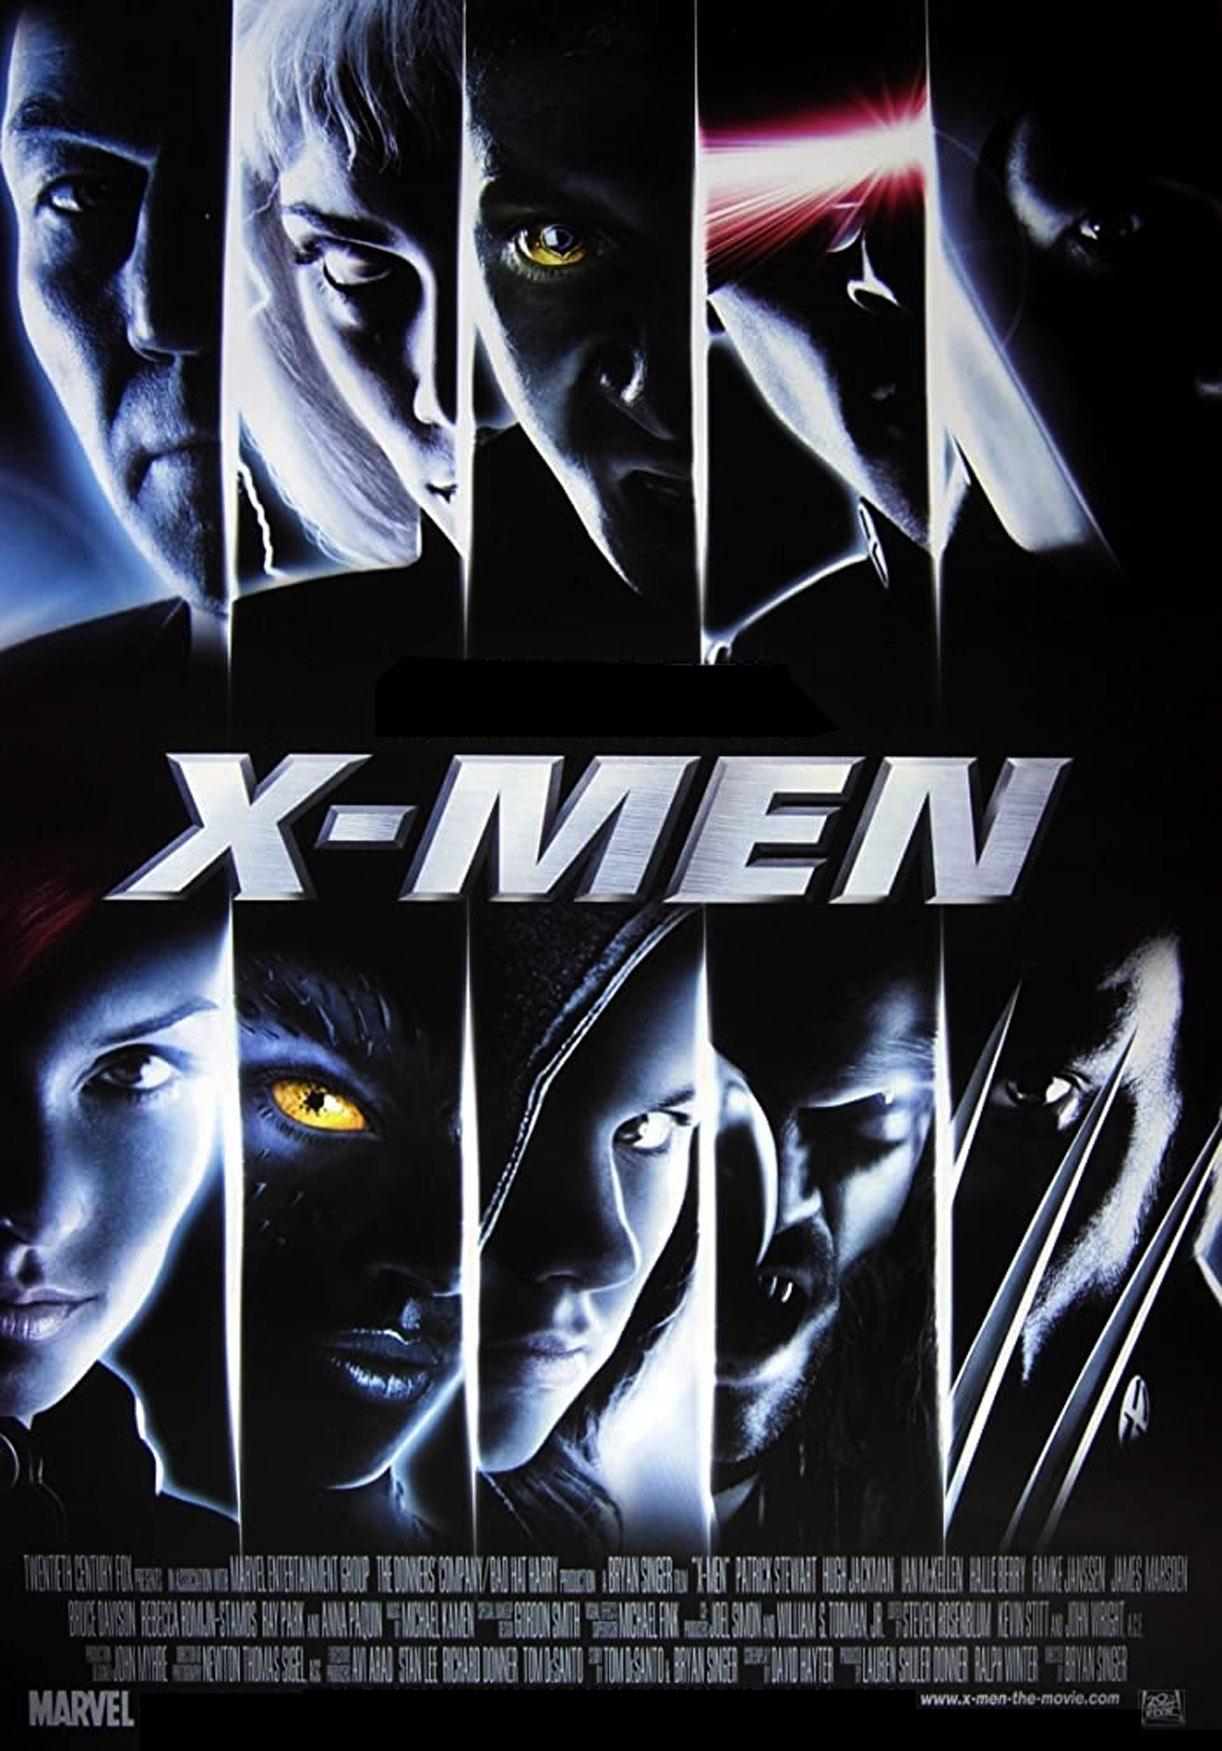 X-Men hadde premiere 14. juli 2000 (Marvel/Fox)